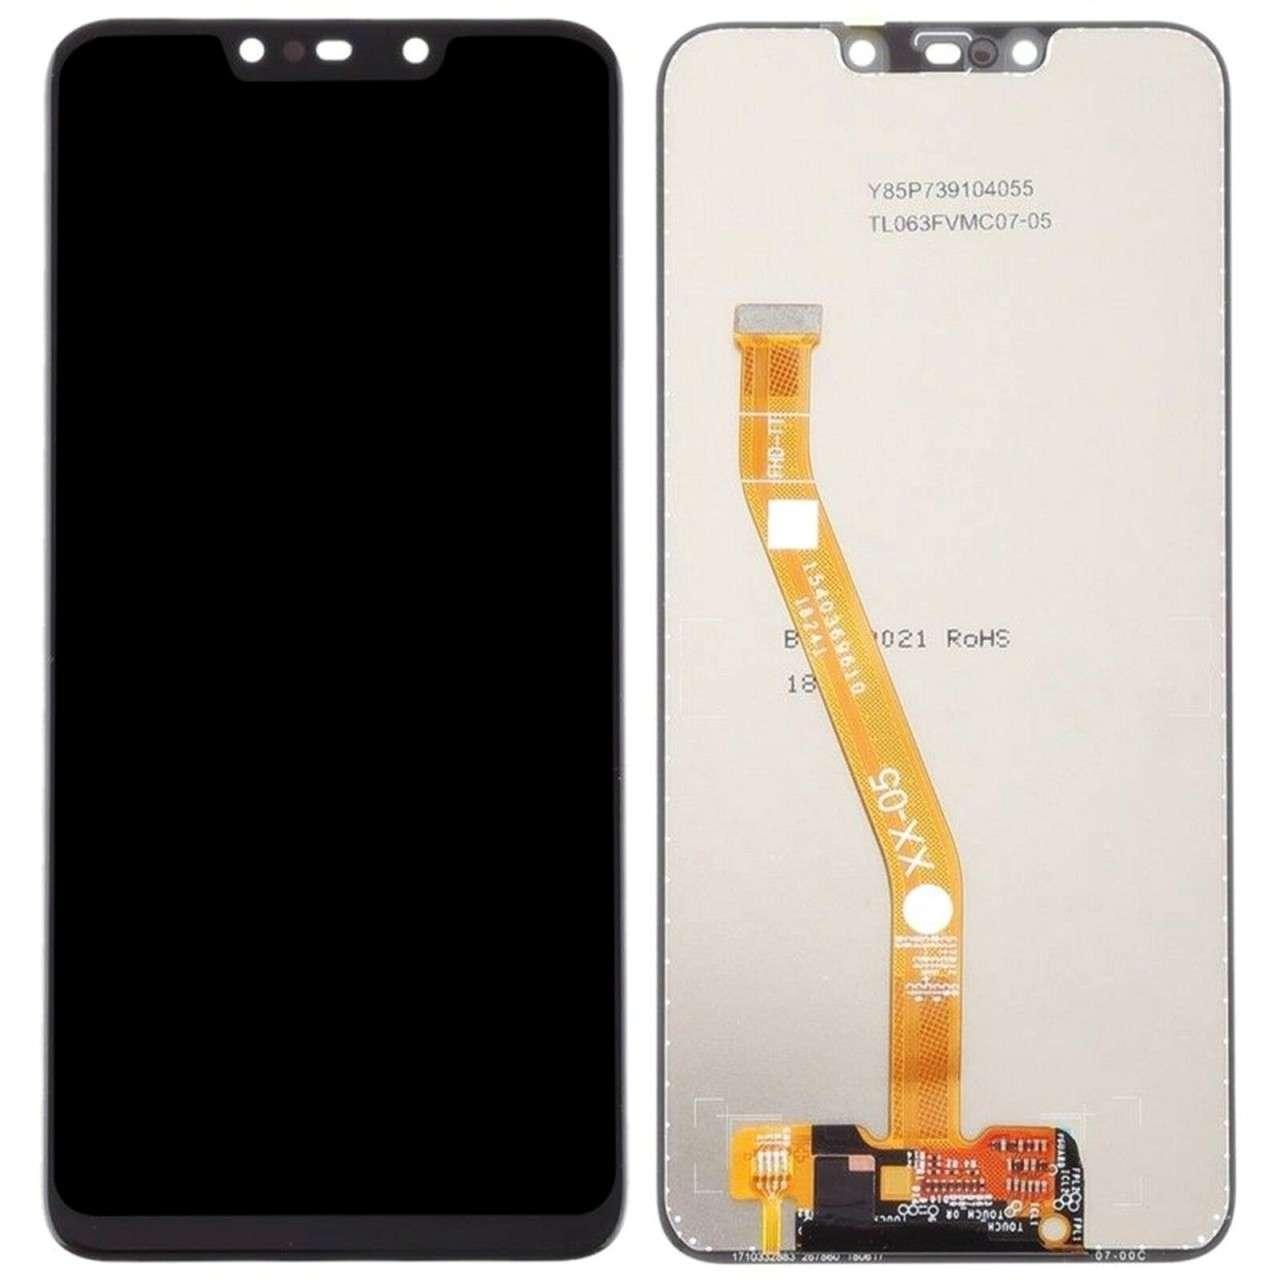 Display Huawei Nova 3i Black Negru imagine powerlaptop.ro 2021